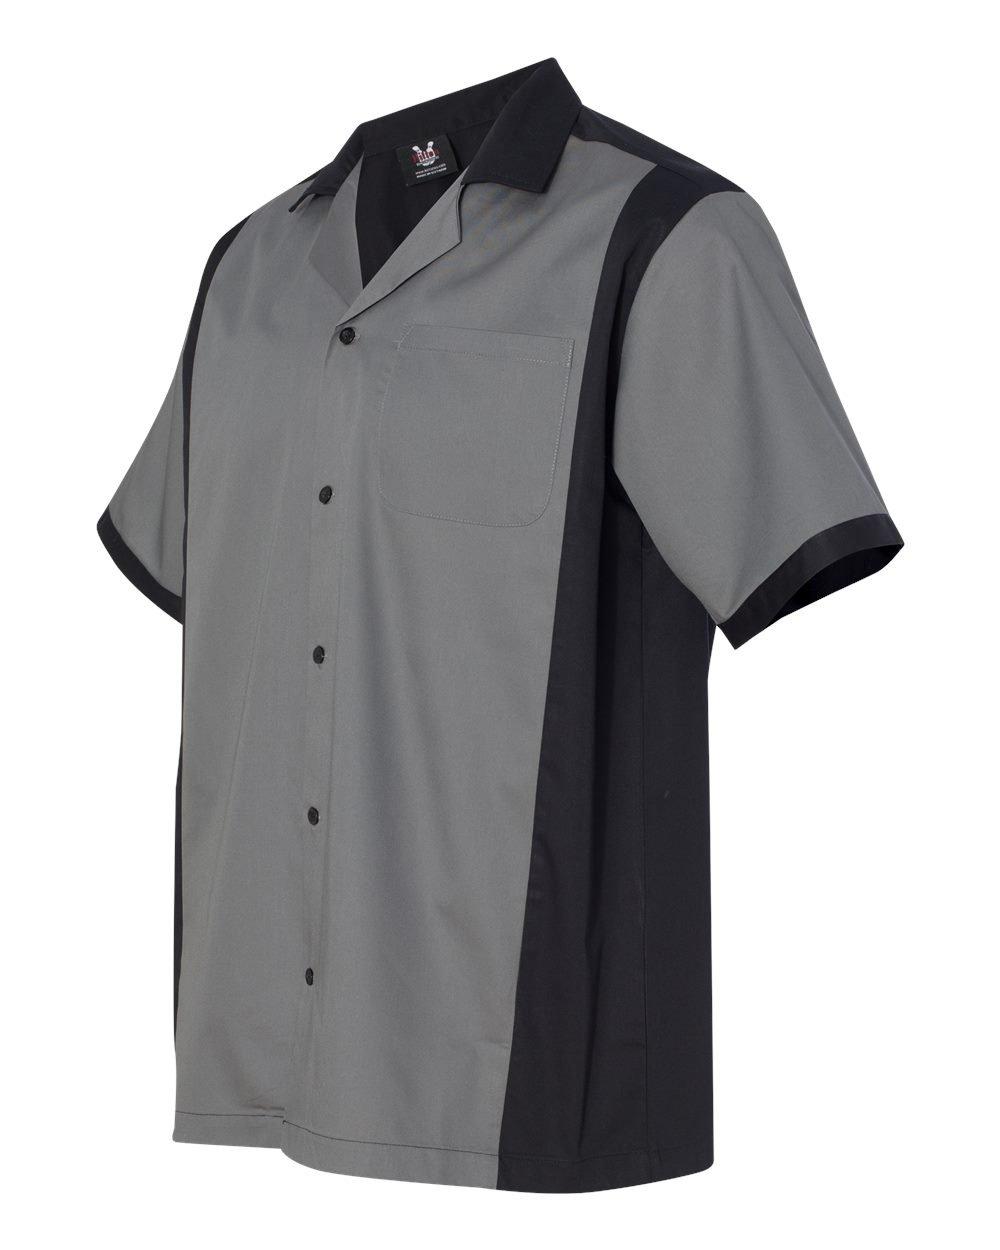 Hilton Cruiser Bowling Shirt - Slate - Medium by Hilton